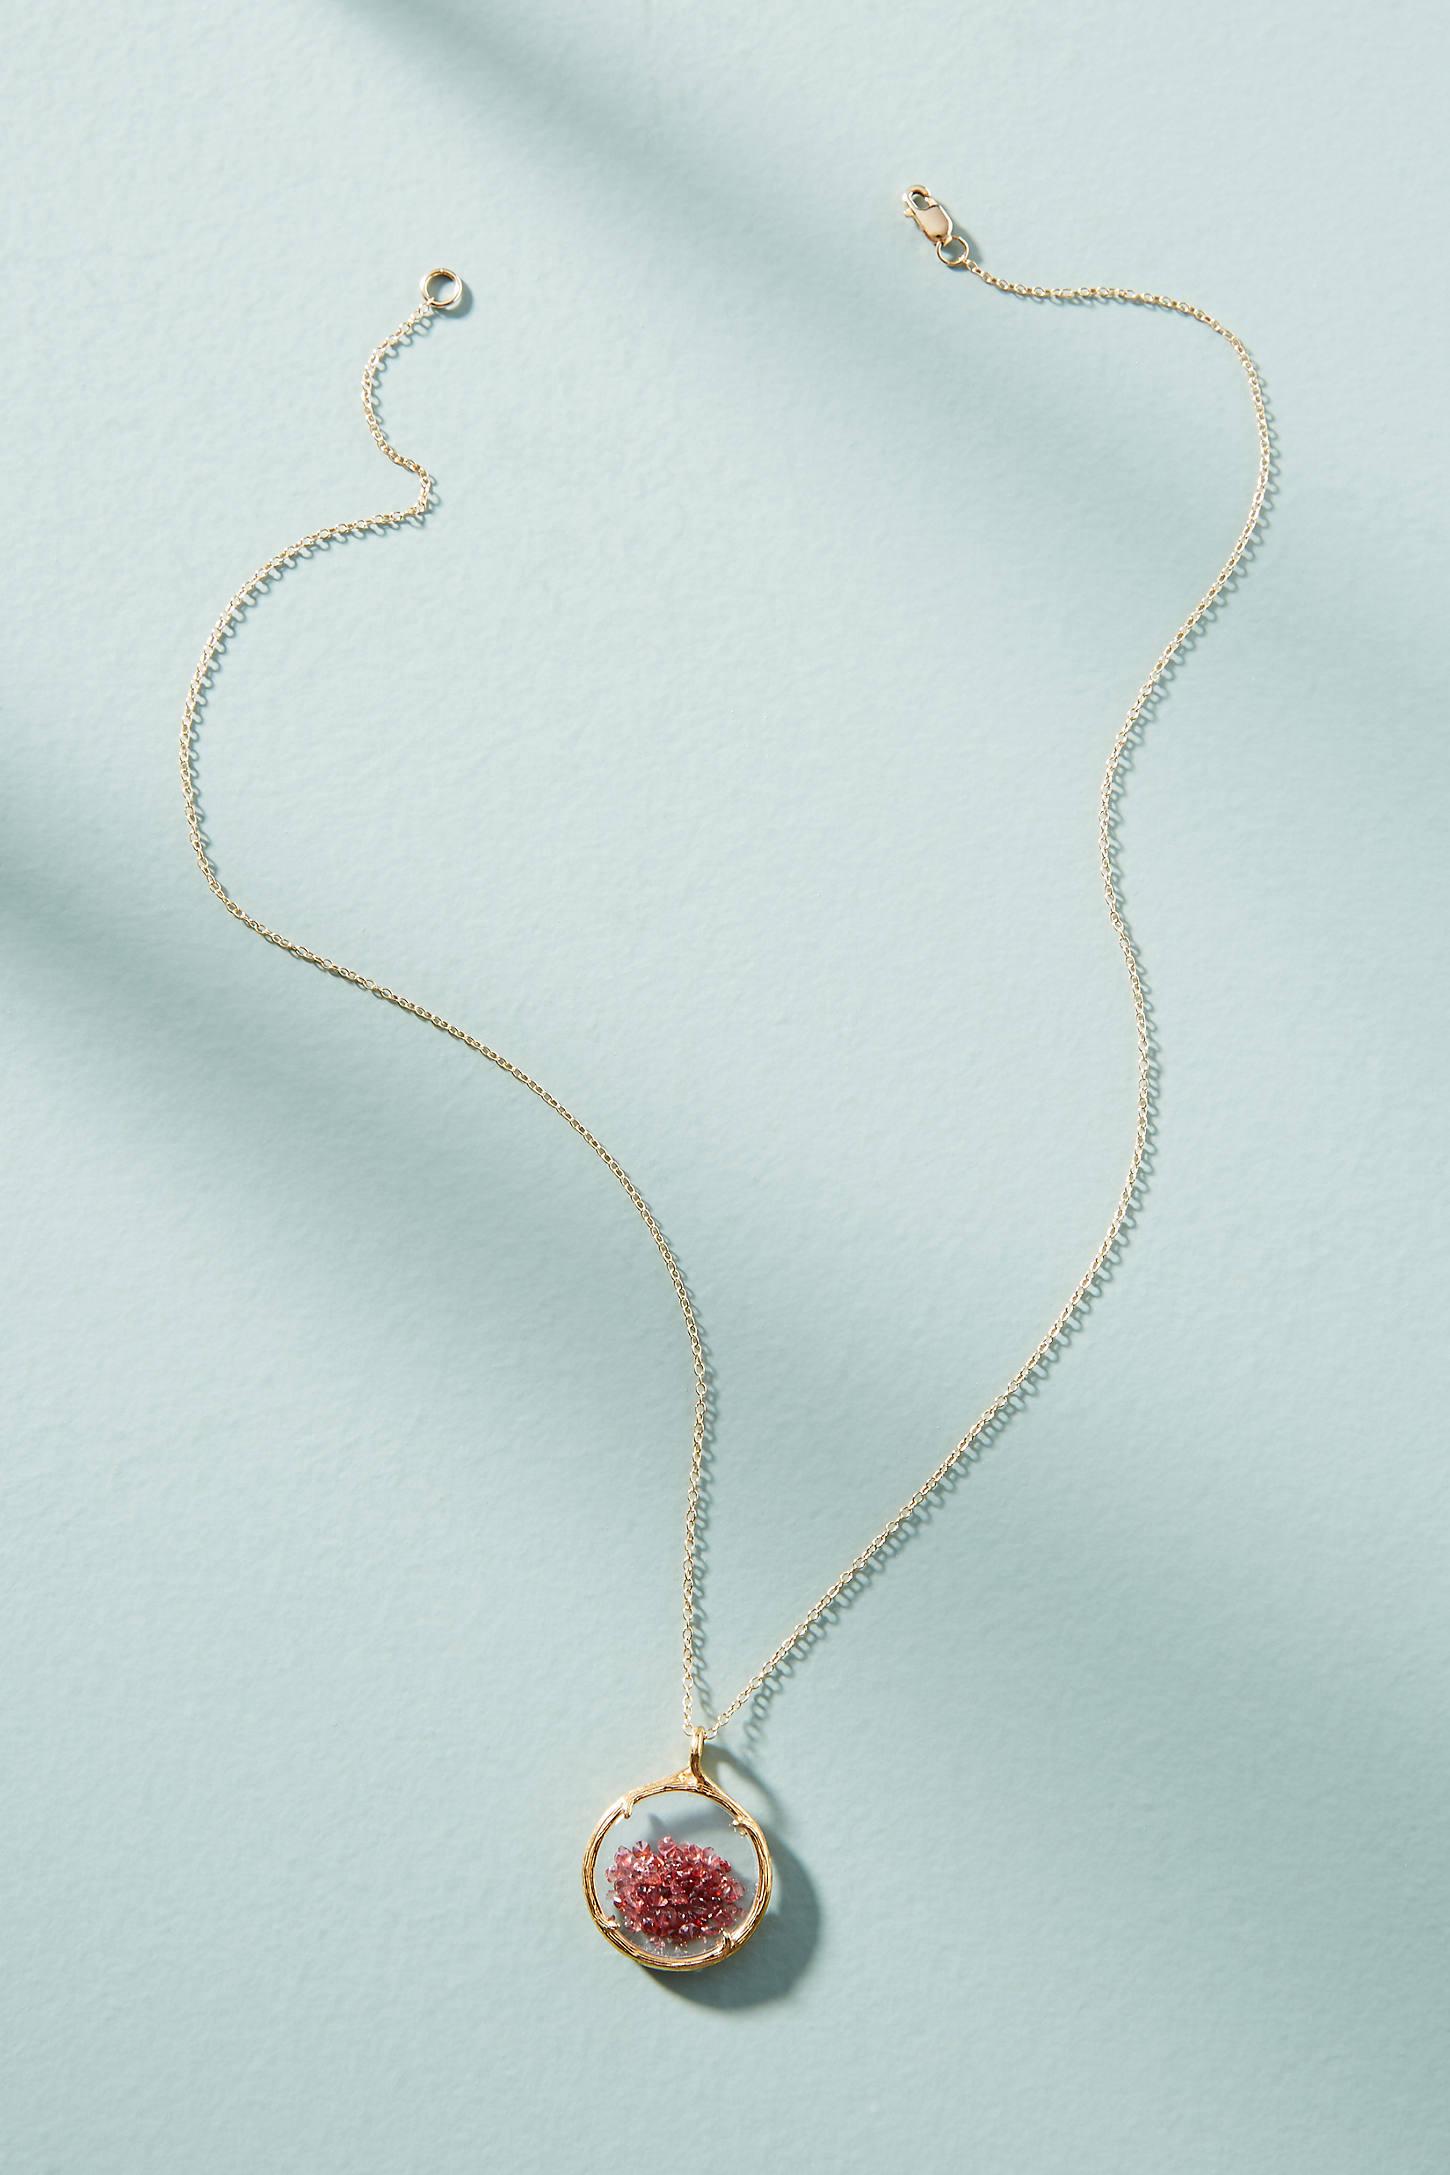 Birthstone Shaker Necklace